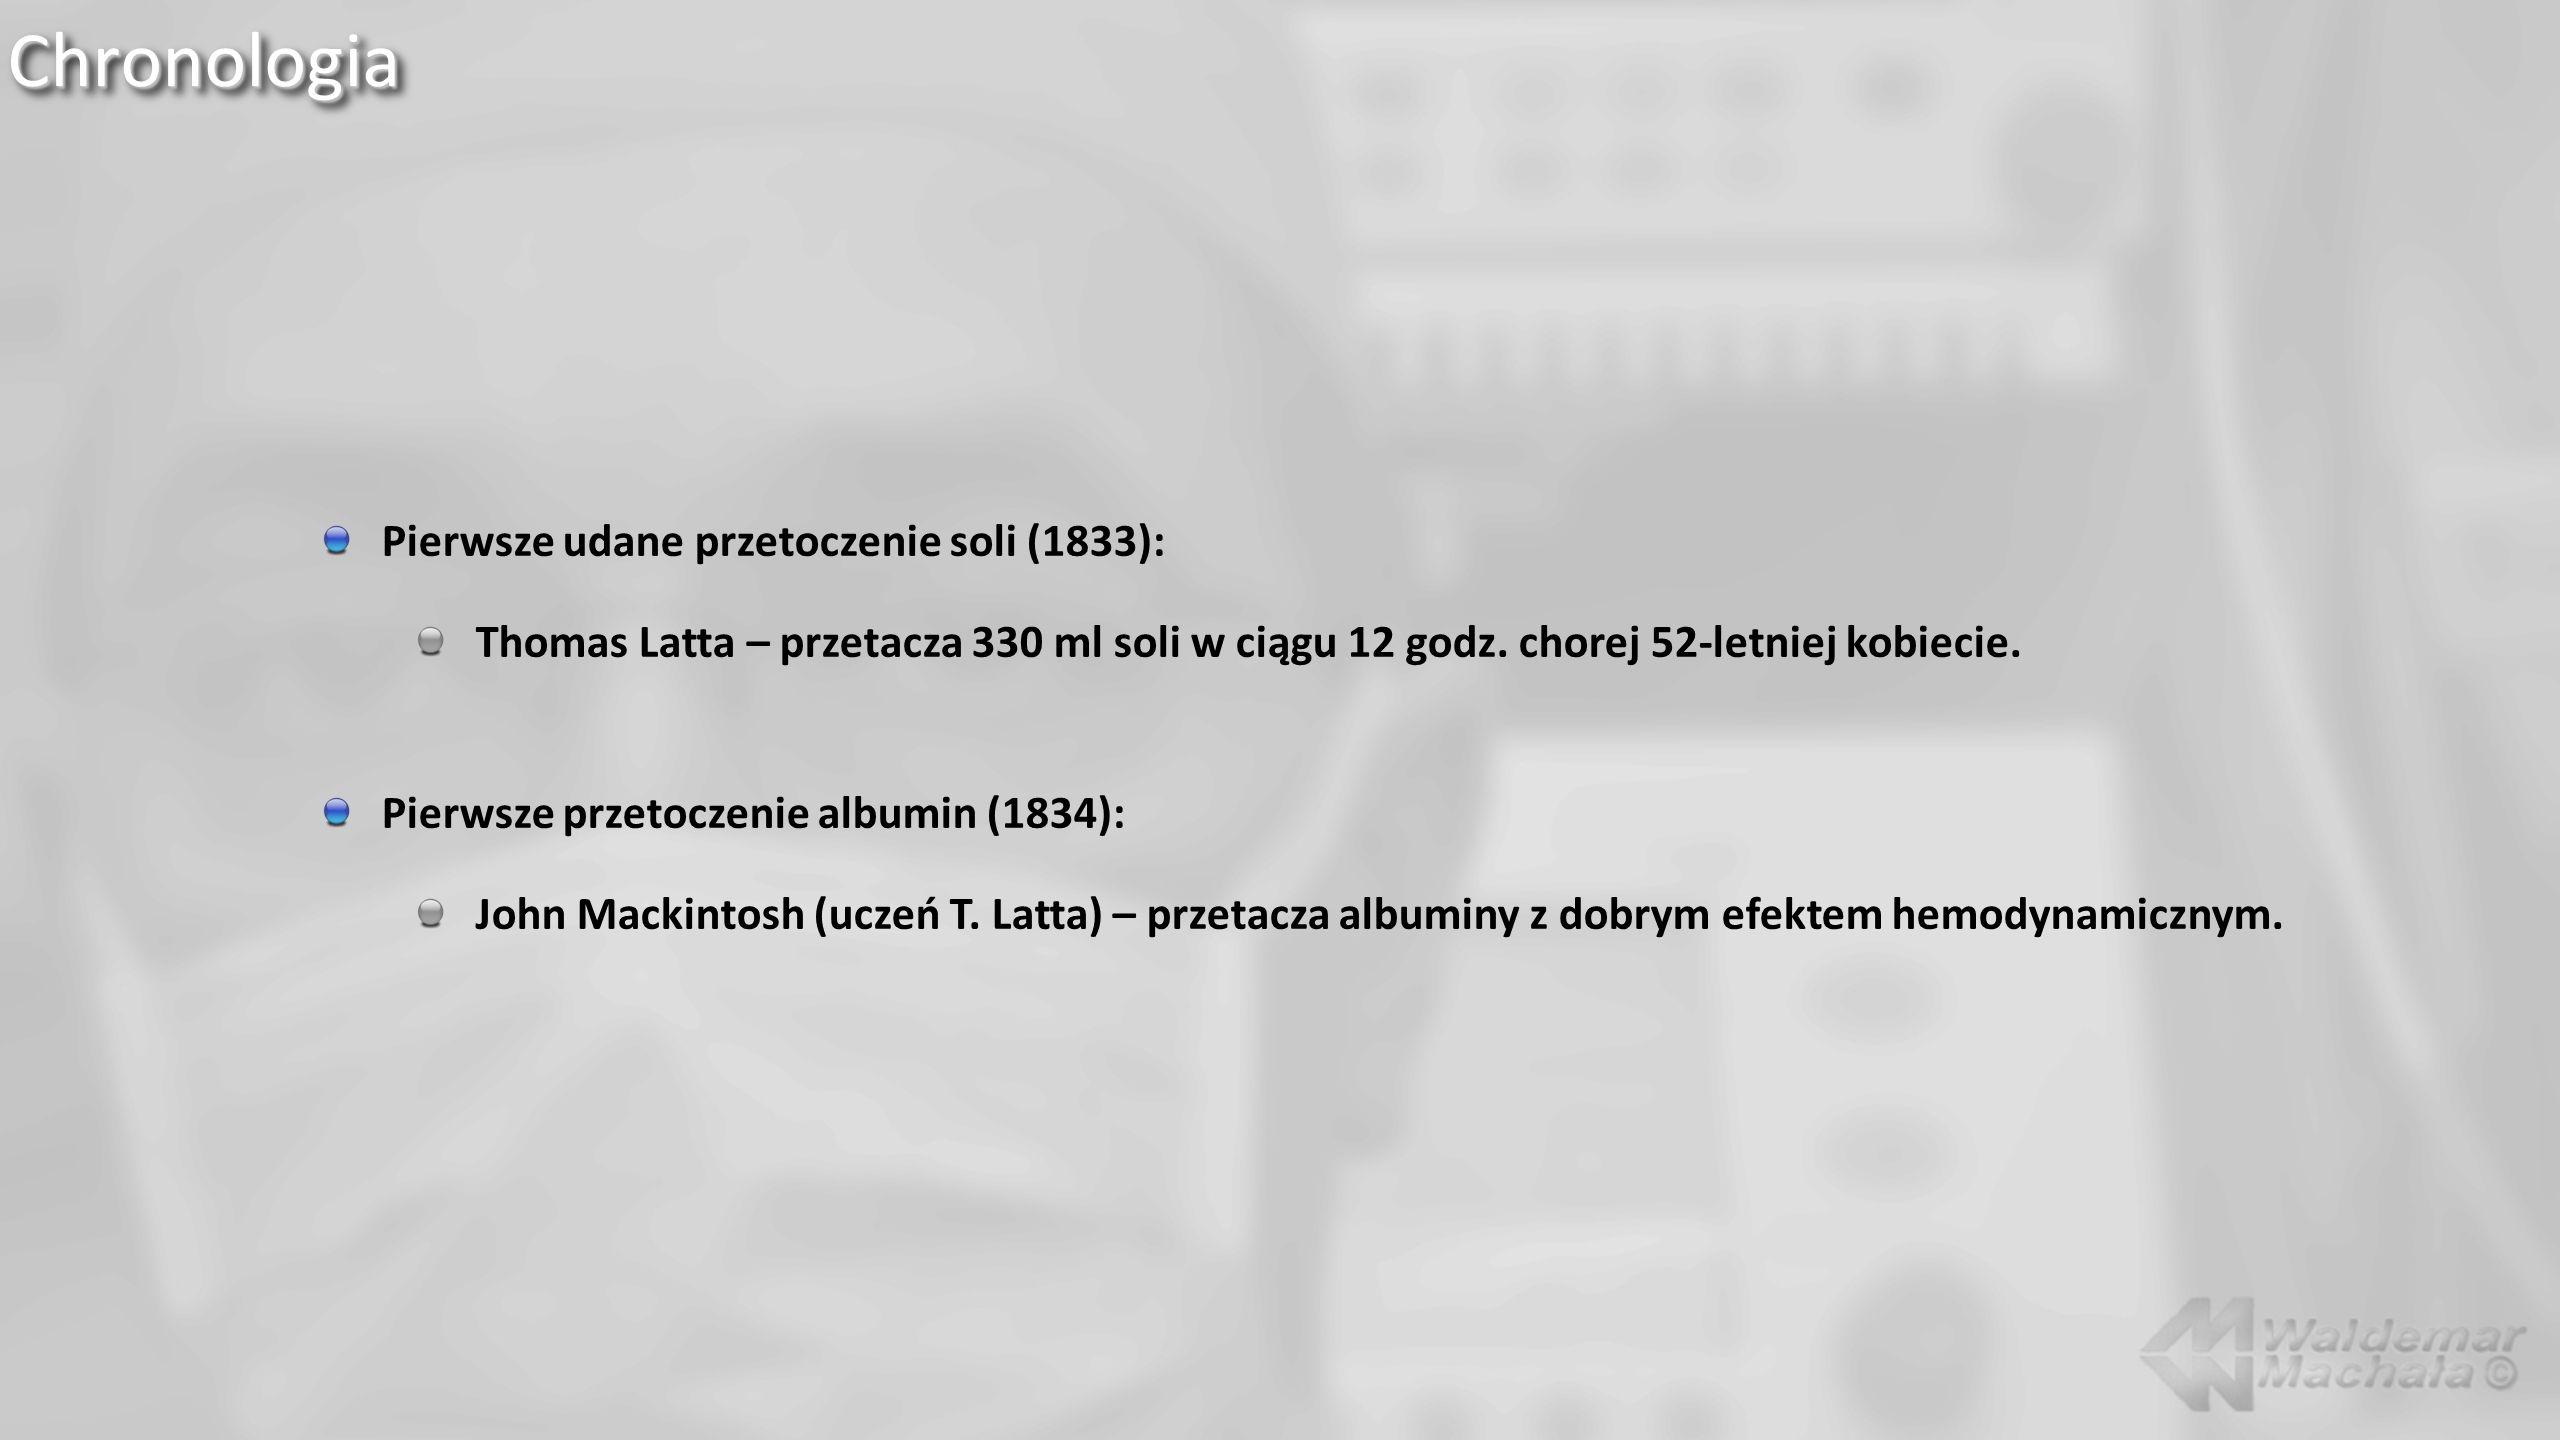 Liczba płytek krwi: <50 0002 pkt.50 – 100 0001 pkt.